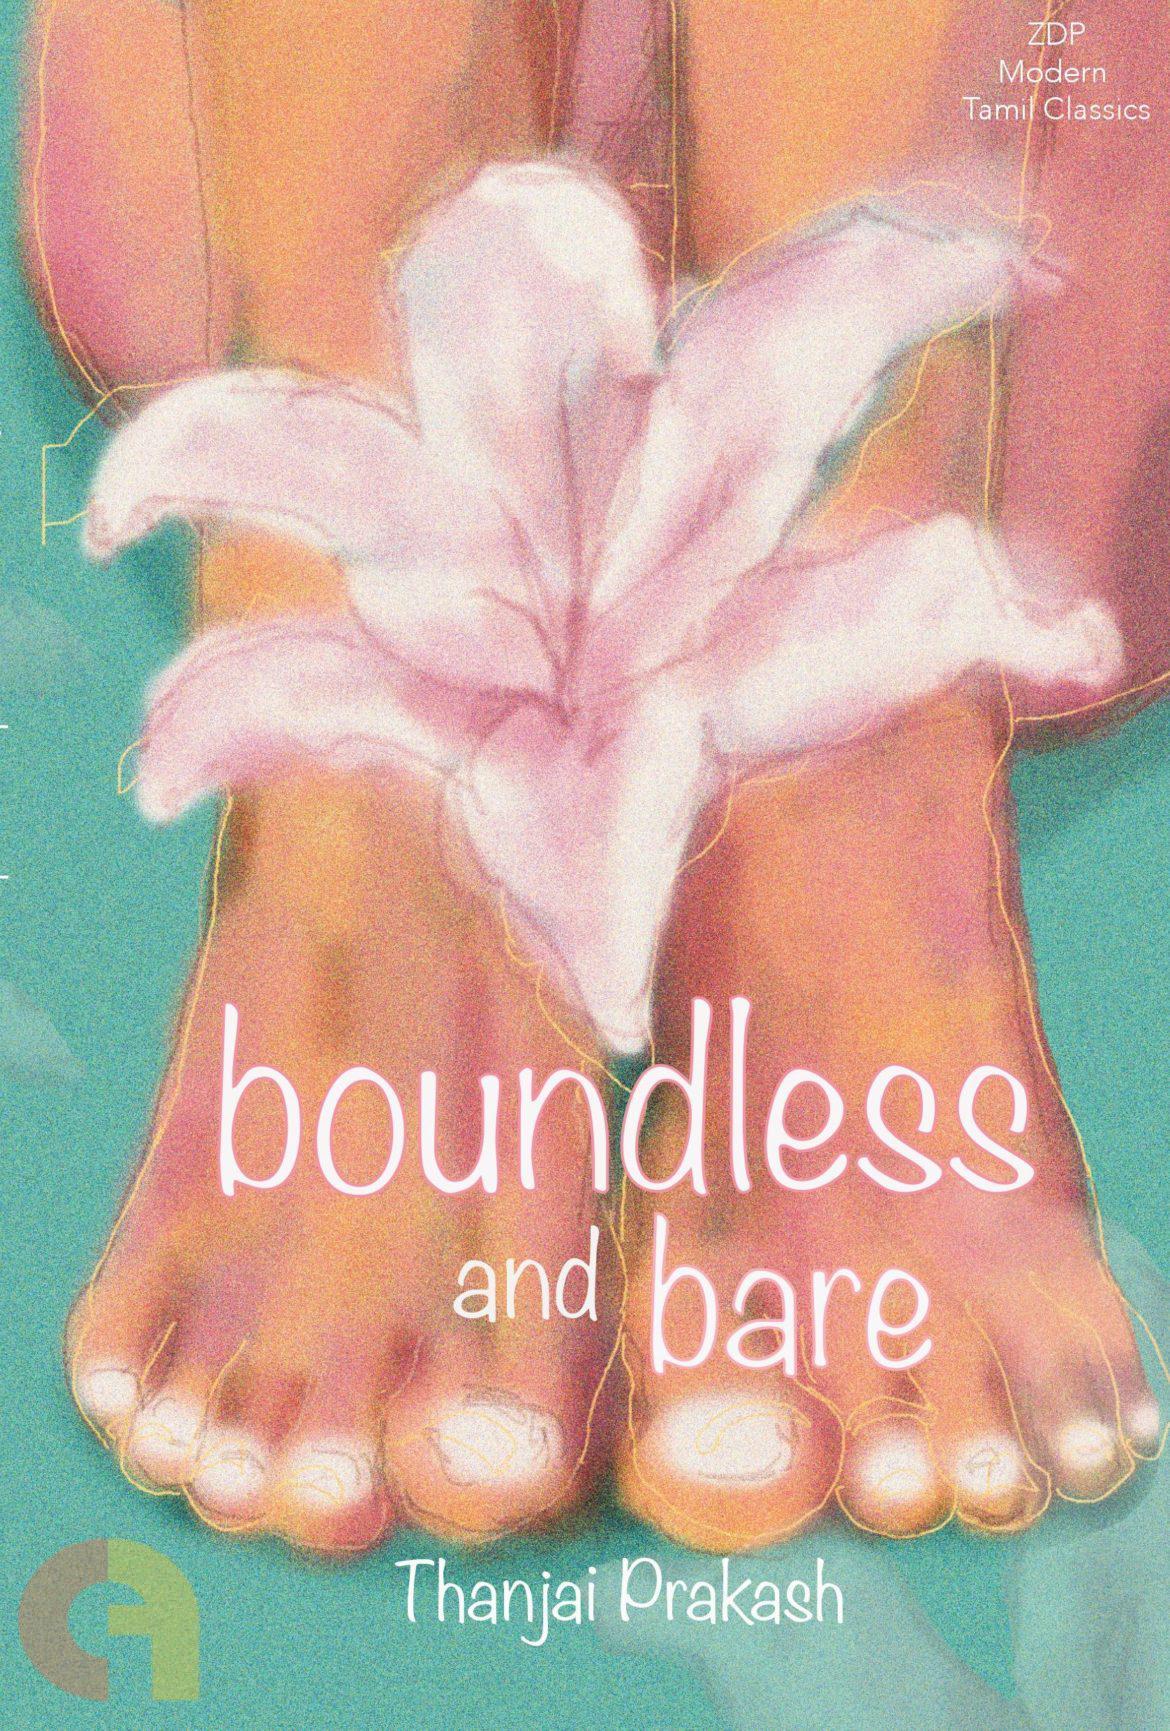 Boundless And Bare (Thanjai Prakash)